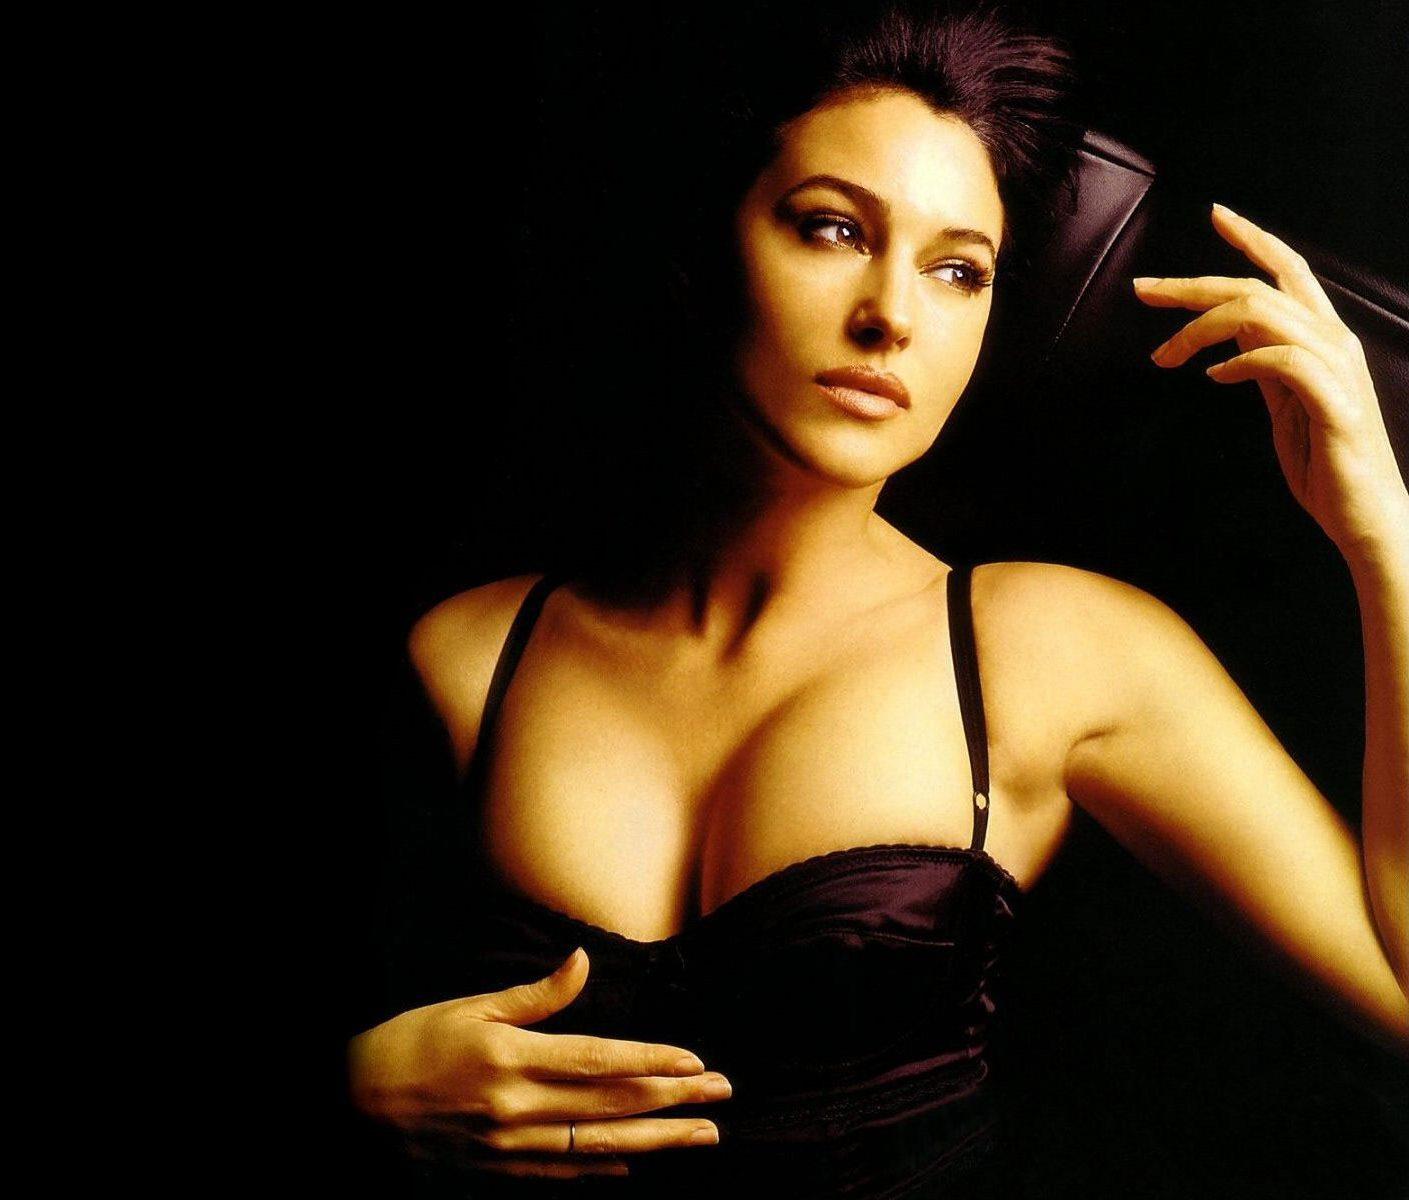 Www καυτά μαύρο σεξ βίντεο com